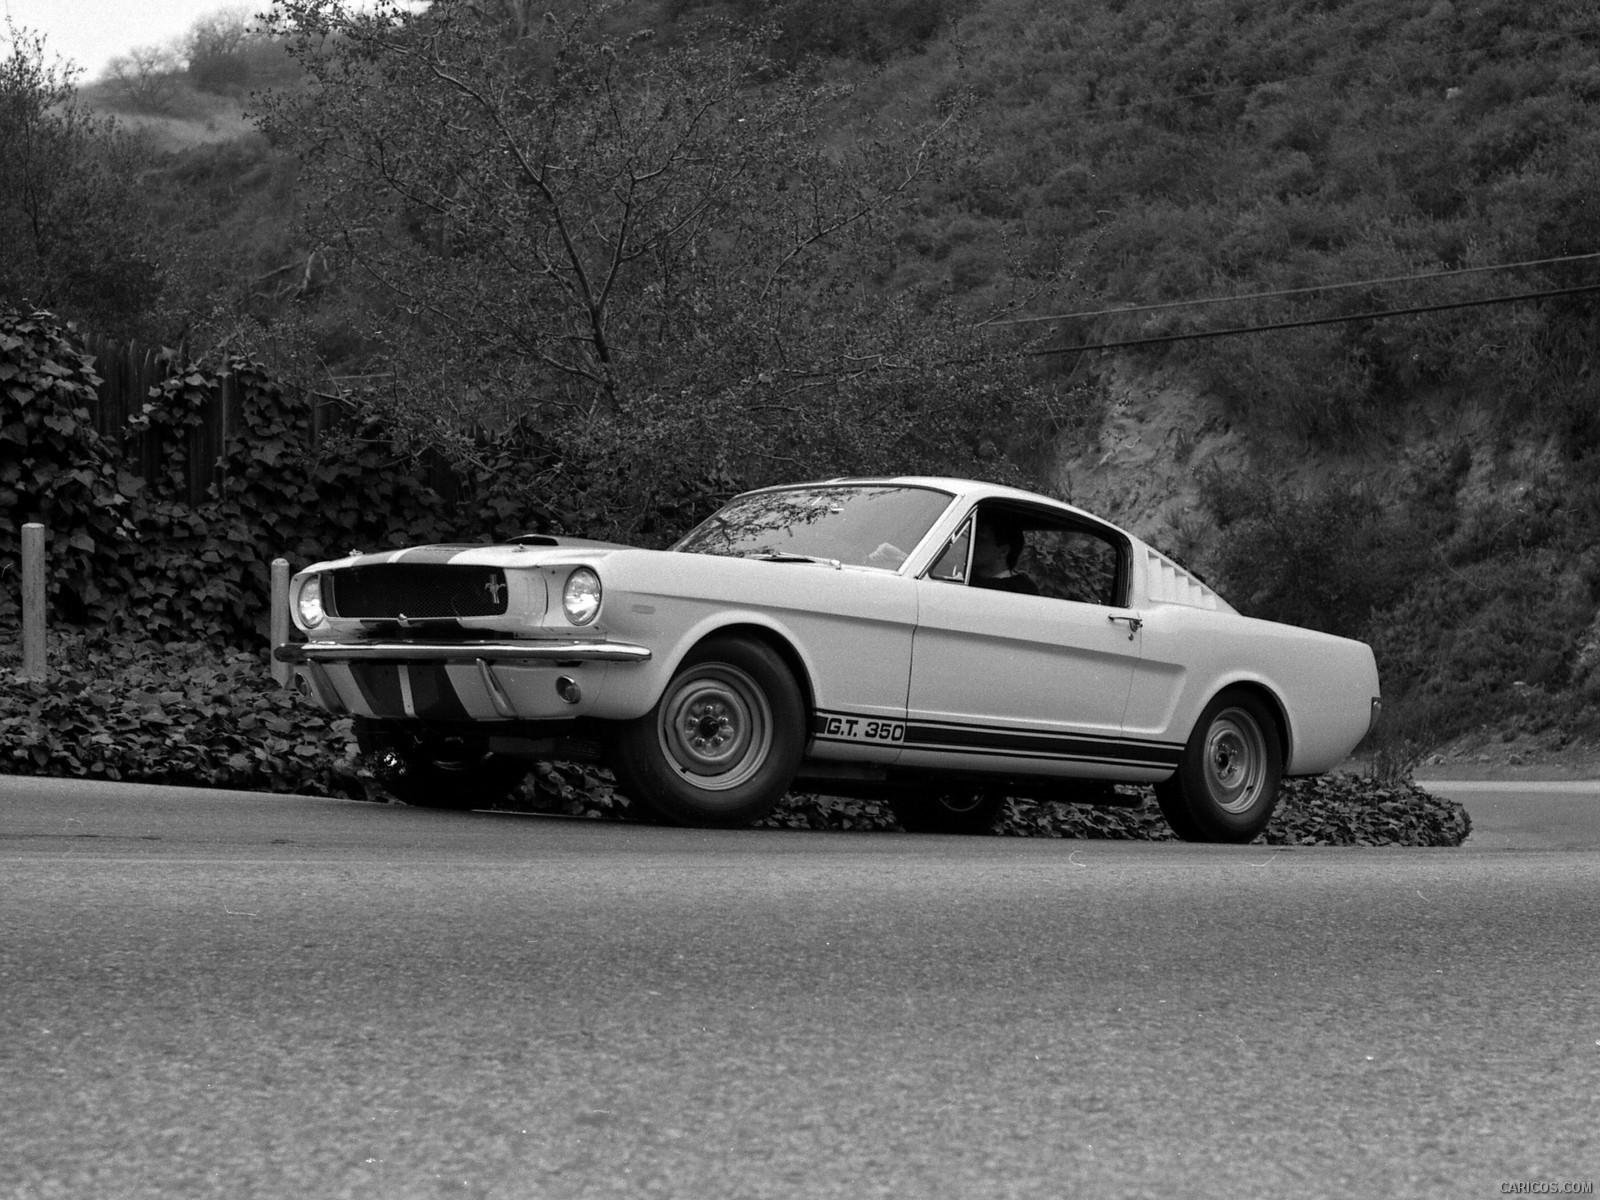 Ford Mustang Shelby GT350 uhd duvarkağıdı